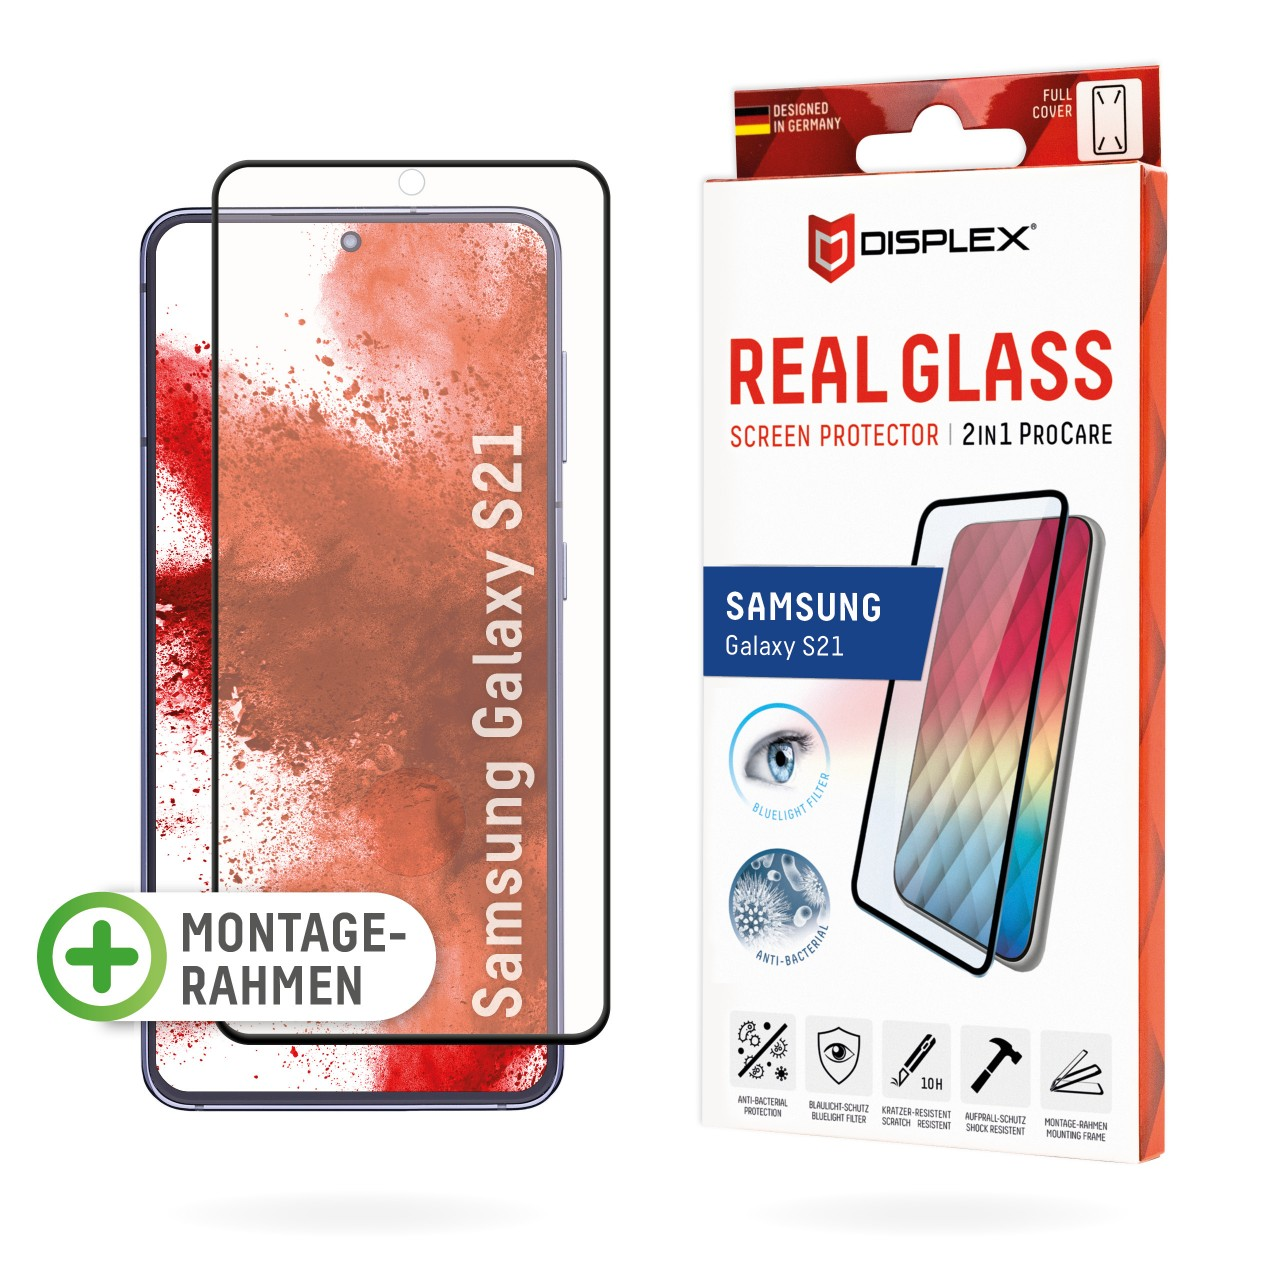 "Real Glass 2in1 ProCare für Samsung Galaxy S21 (6,2""), Full Cover"